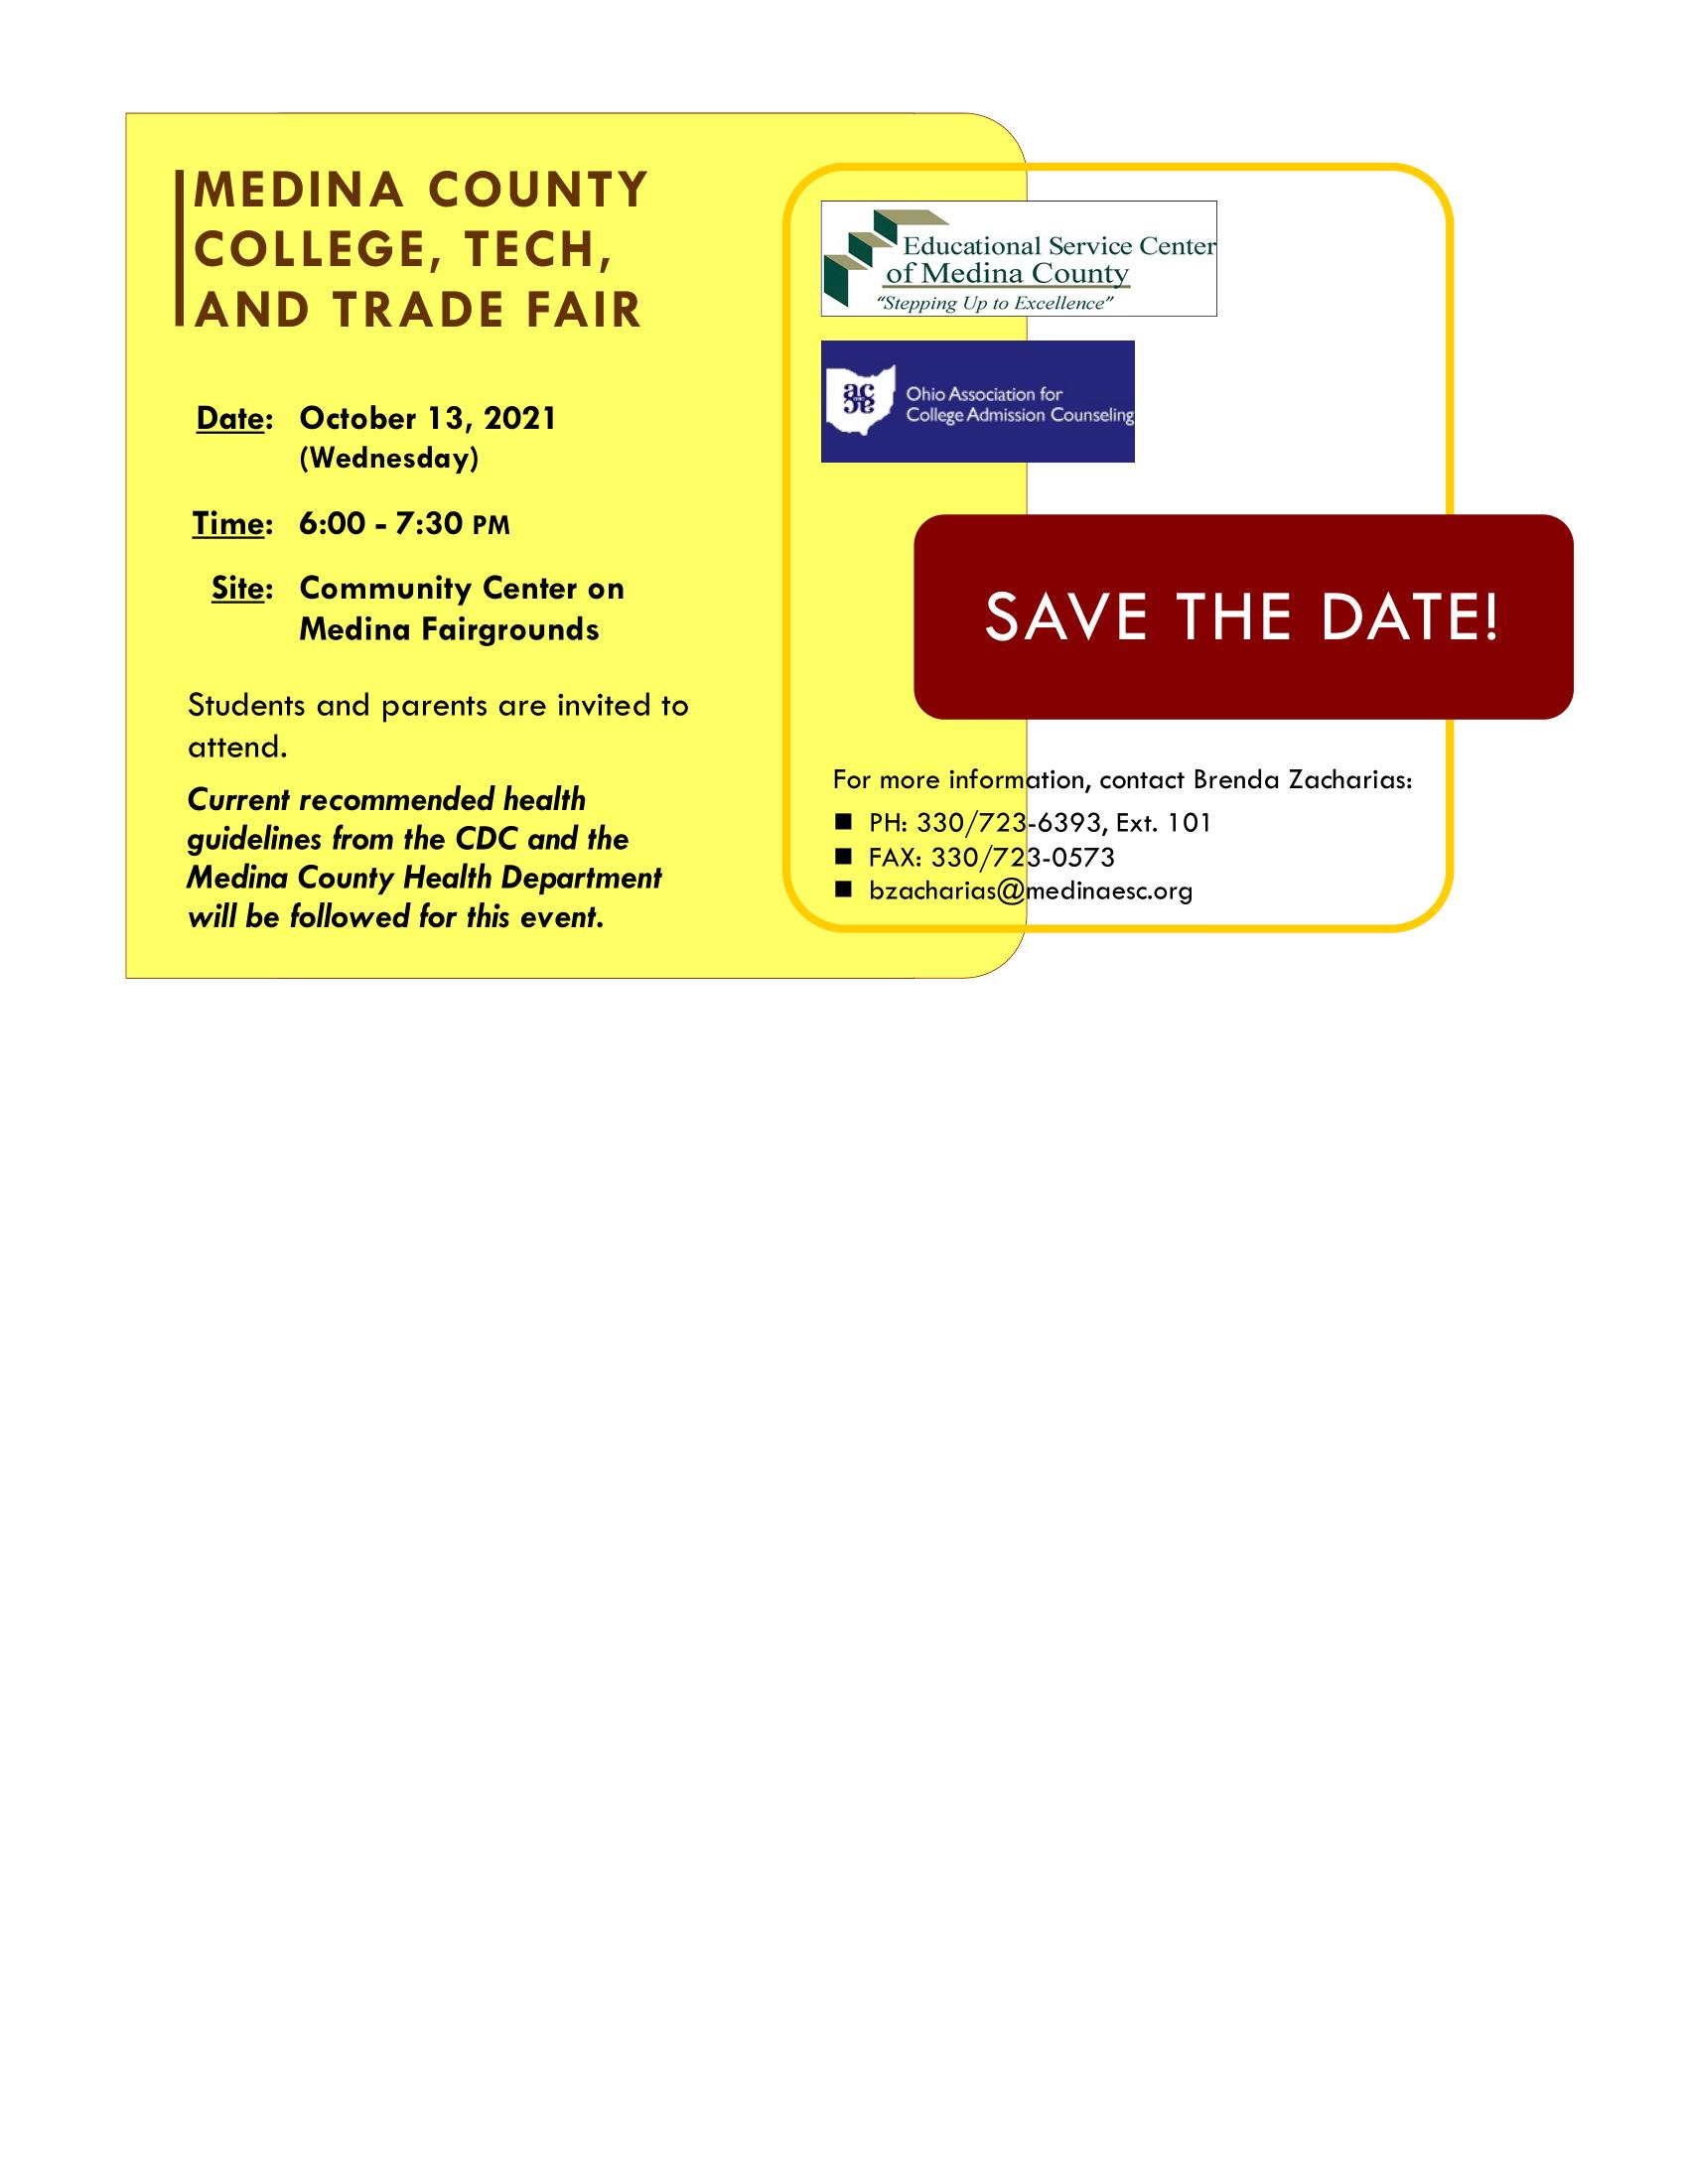 College, Tech and Trade Fair